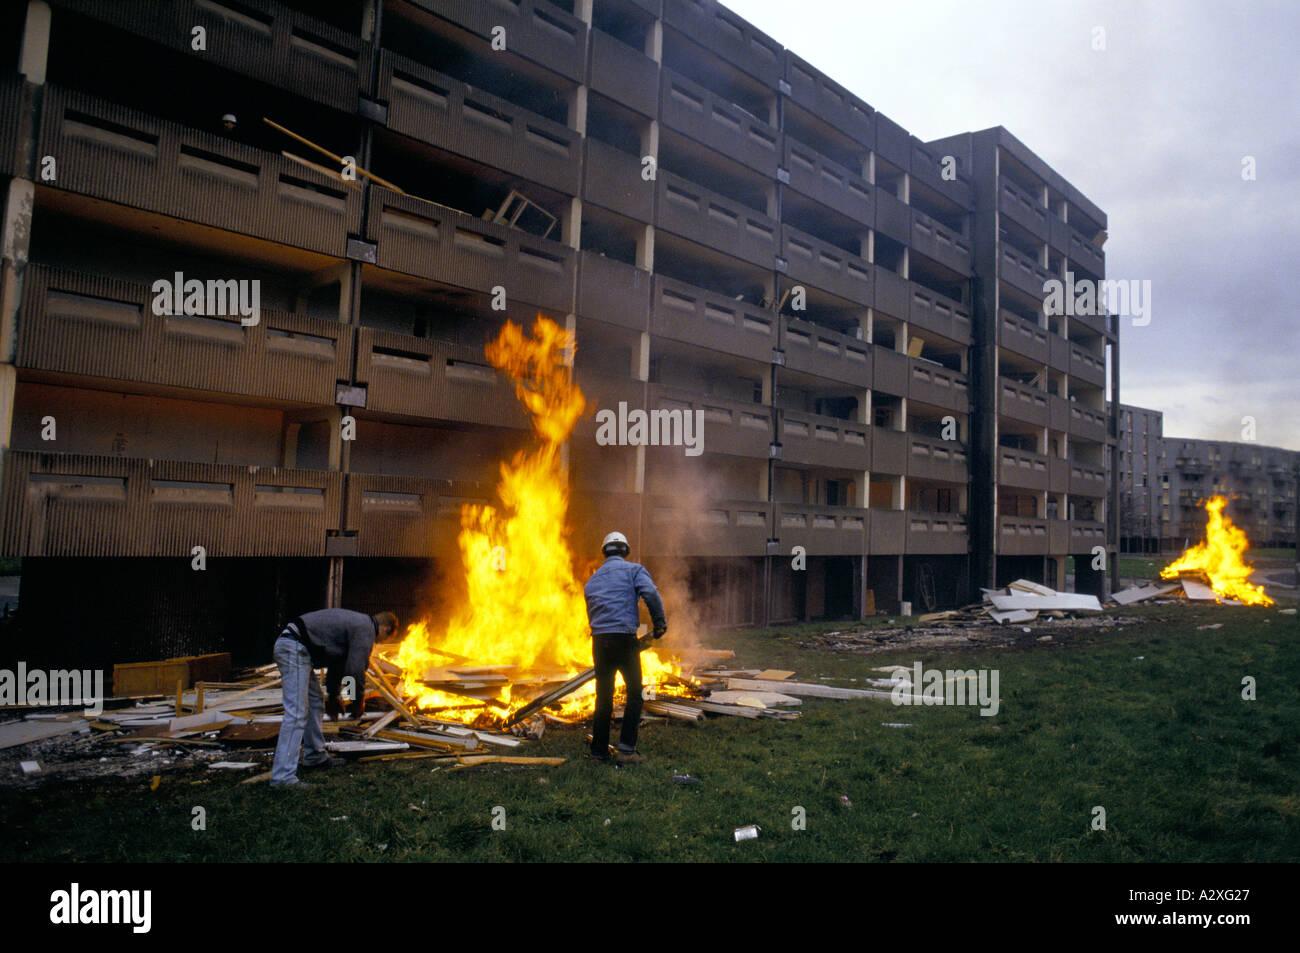 HULME CRESCENT ESTATE BEING DEMOLISHED,MANCHESTER,1993 - Stock Image